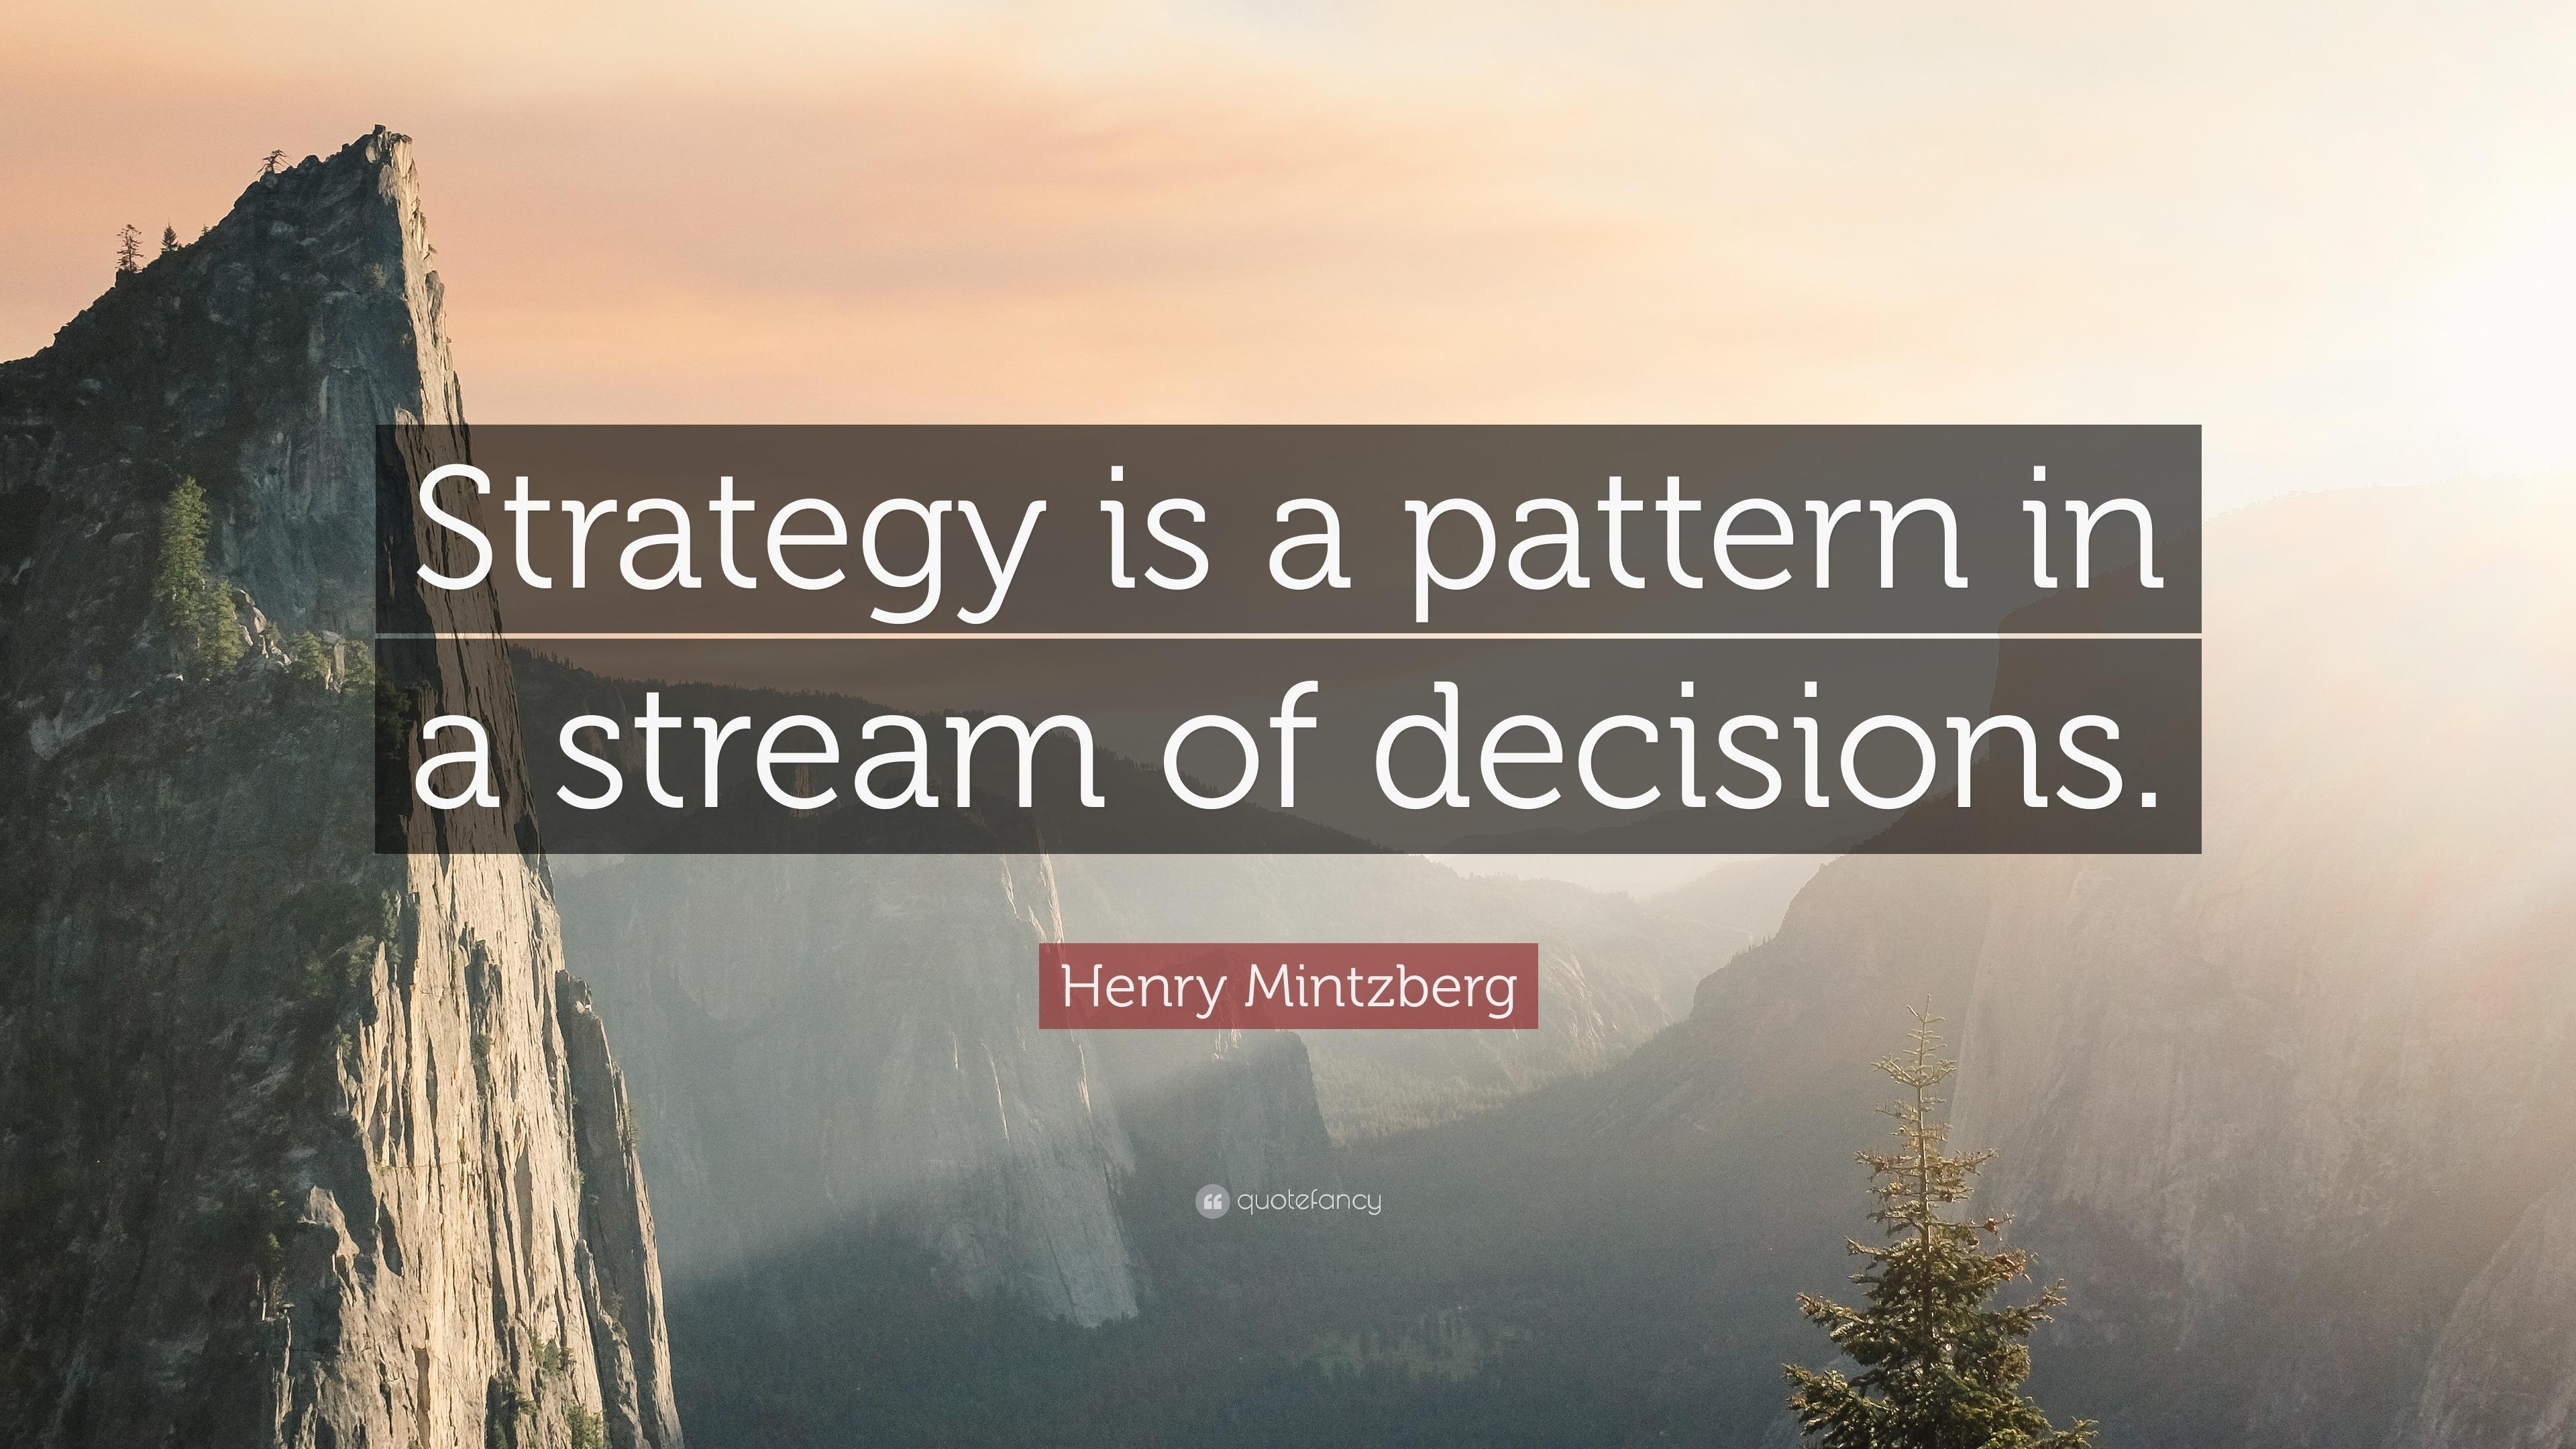 Mintzberg modes of strategic decision